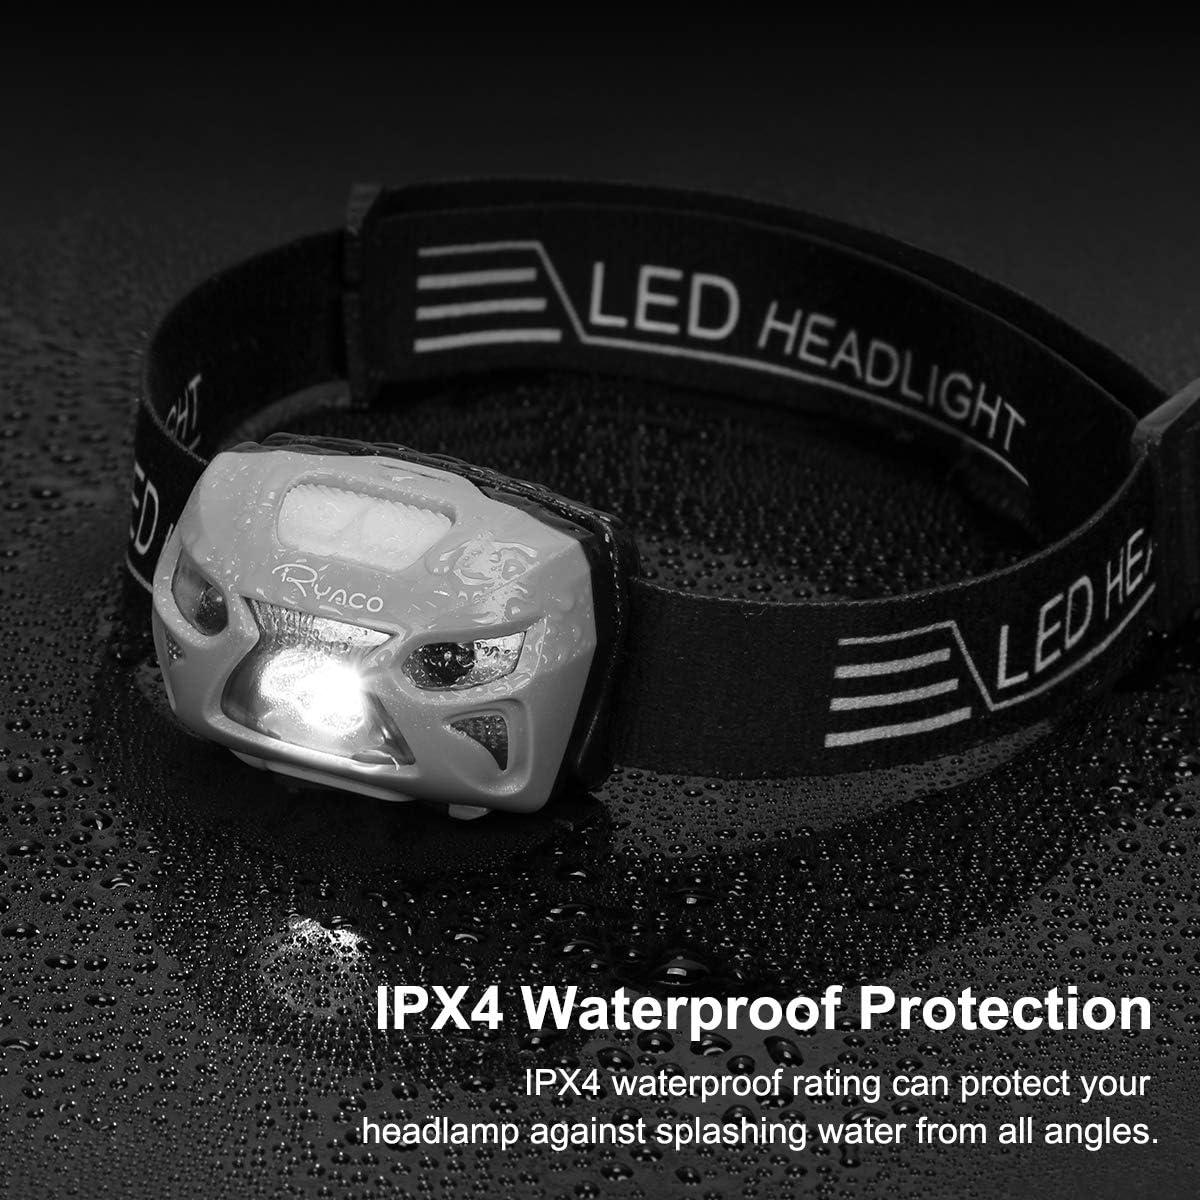 Ciclismo Carrera Linterna Cabeza 4 Modos Sensor de Movimiento Ryaco Linterna Frontal LED USB Recargable 1200mAh Linternas LED Alta Potencia 300 L/úmenes IPX4 Impermeable para Camping Pesca